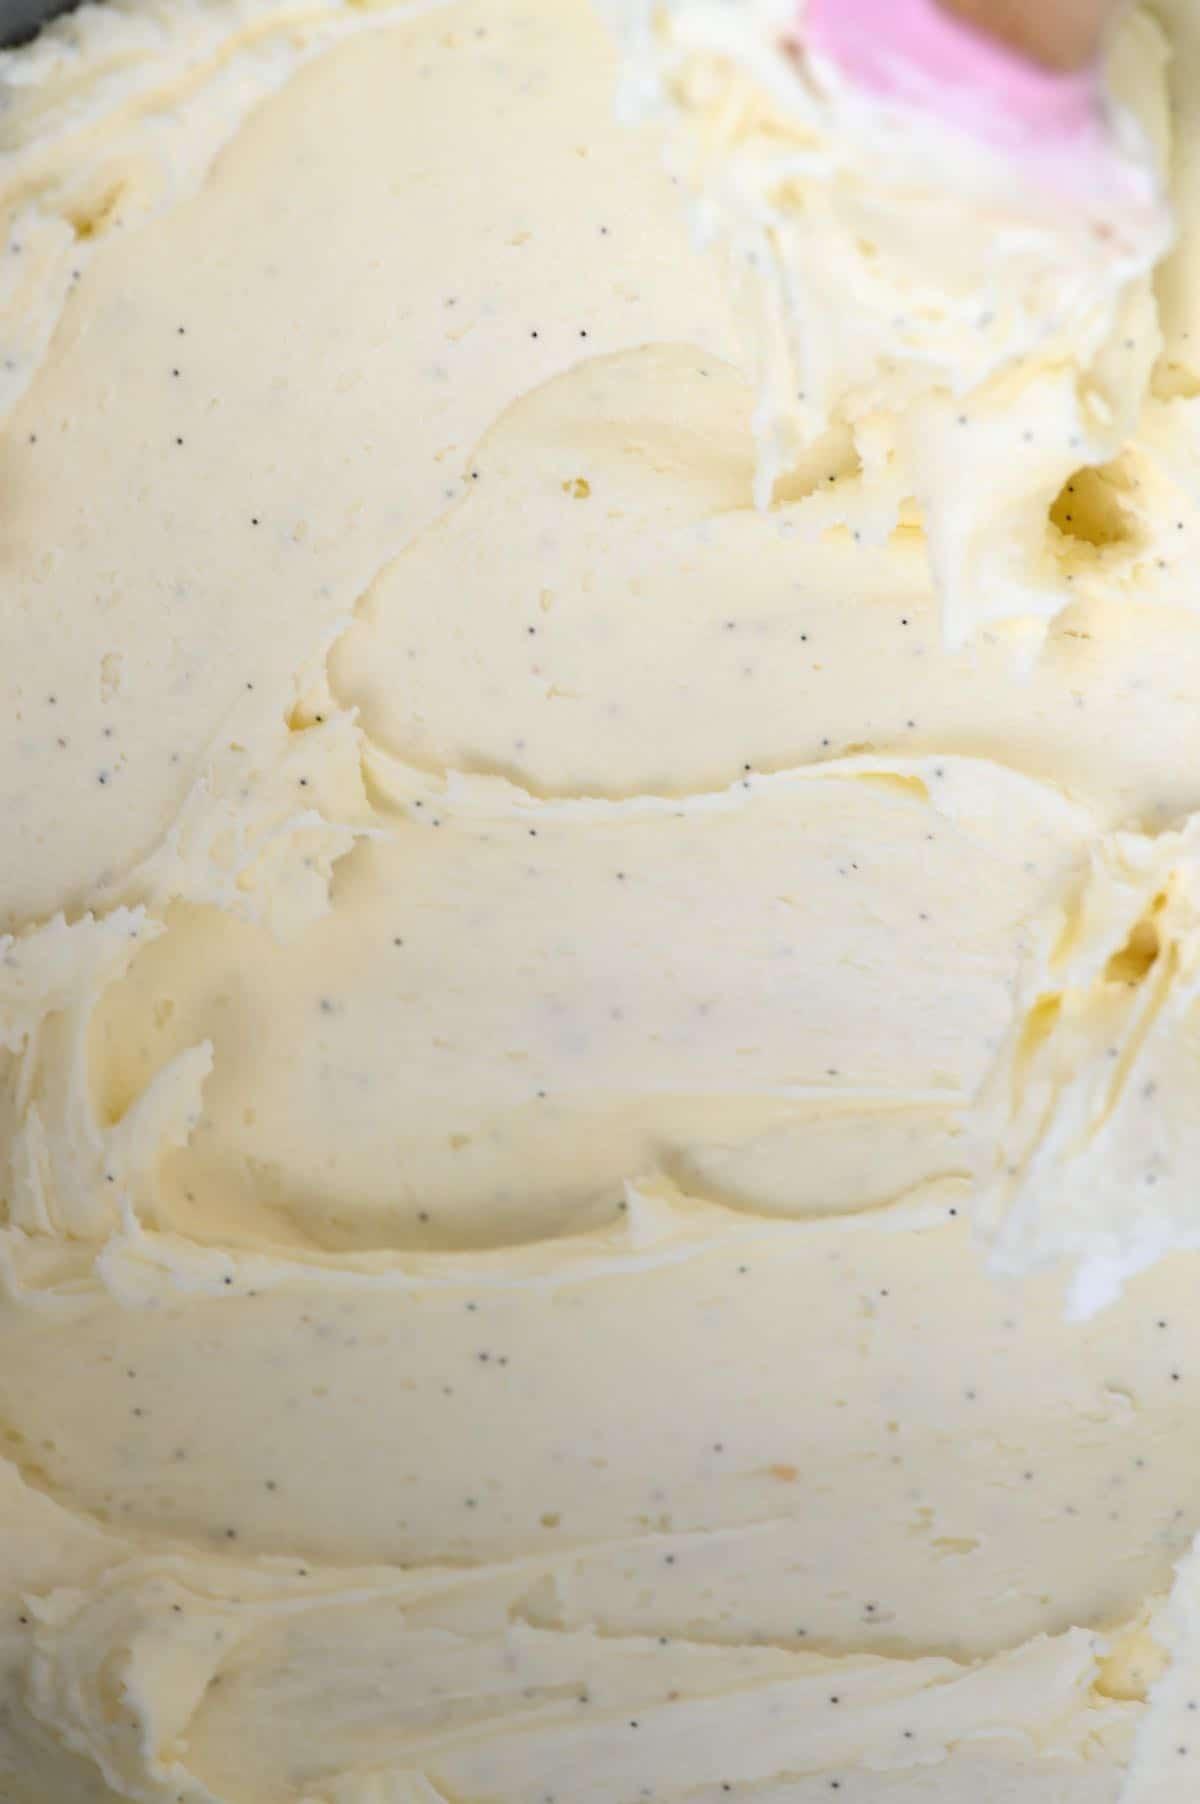 Homemade vanilla buttercream